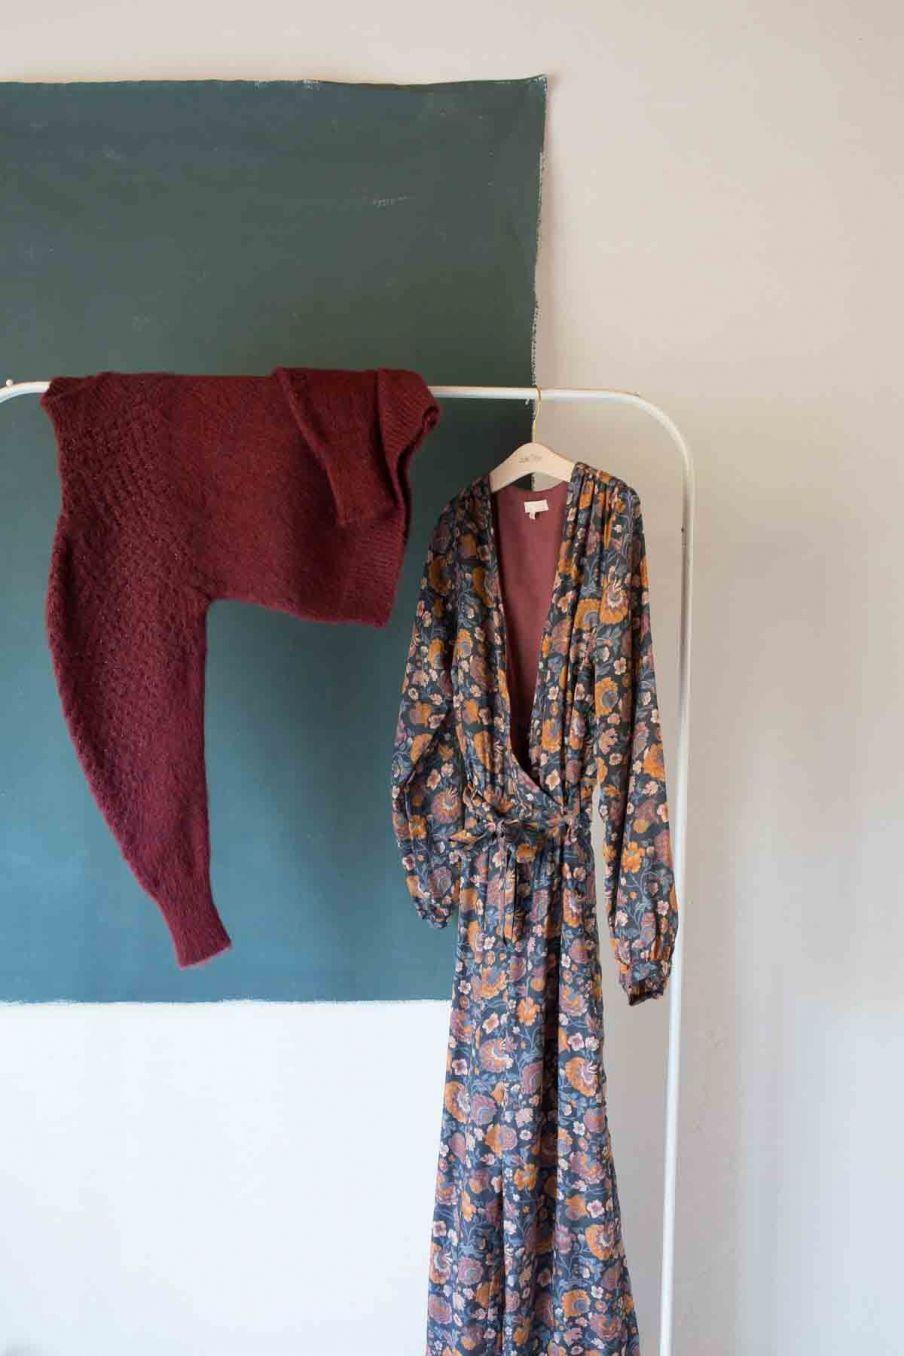 robe femme rama charcoal bohemian flowers - louise misha